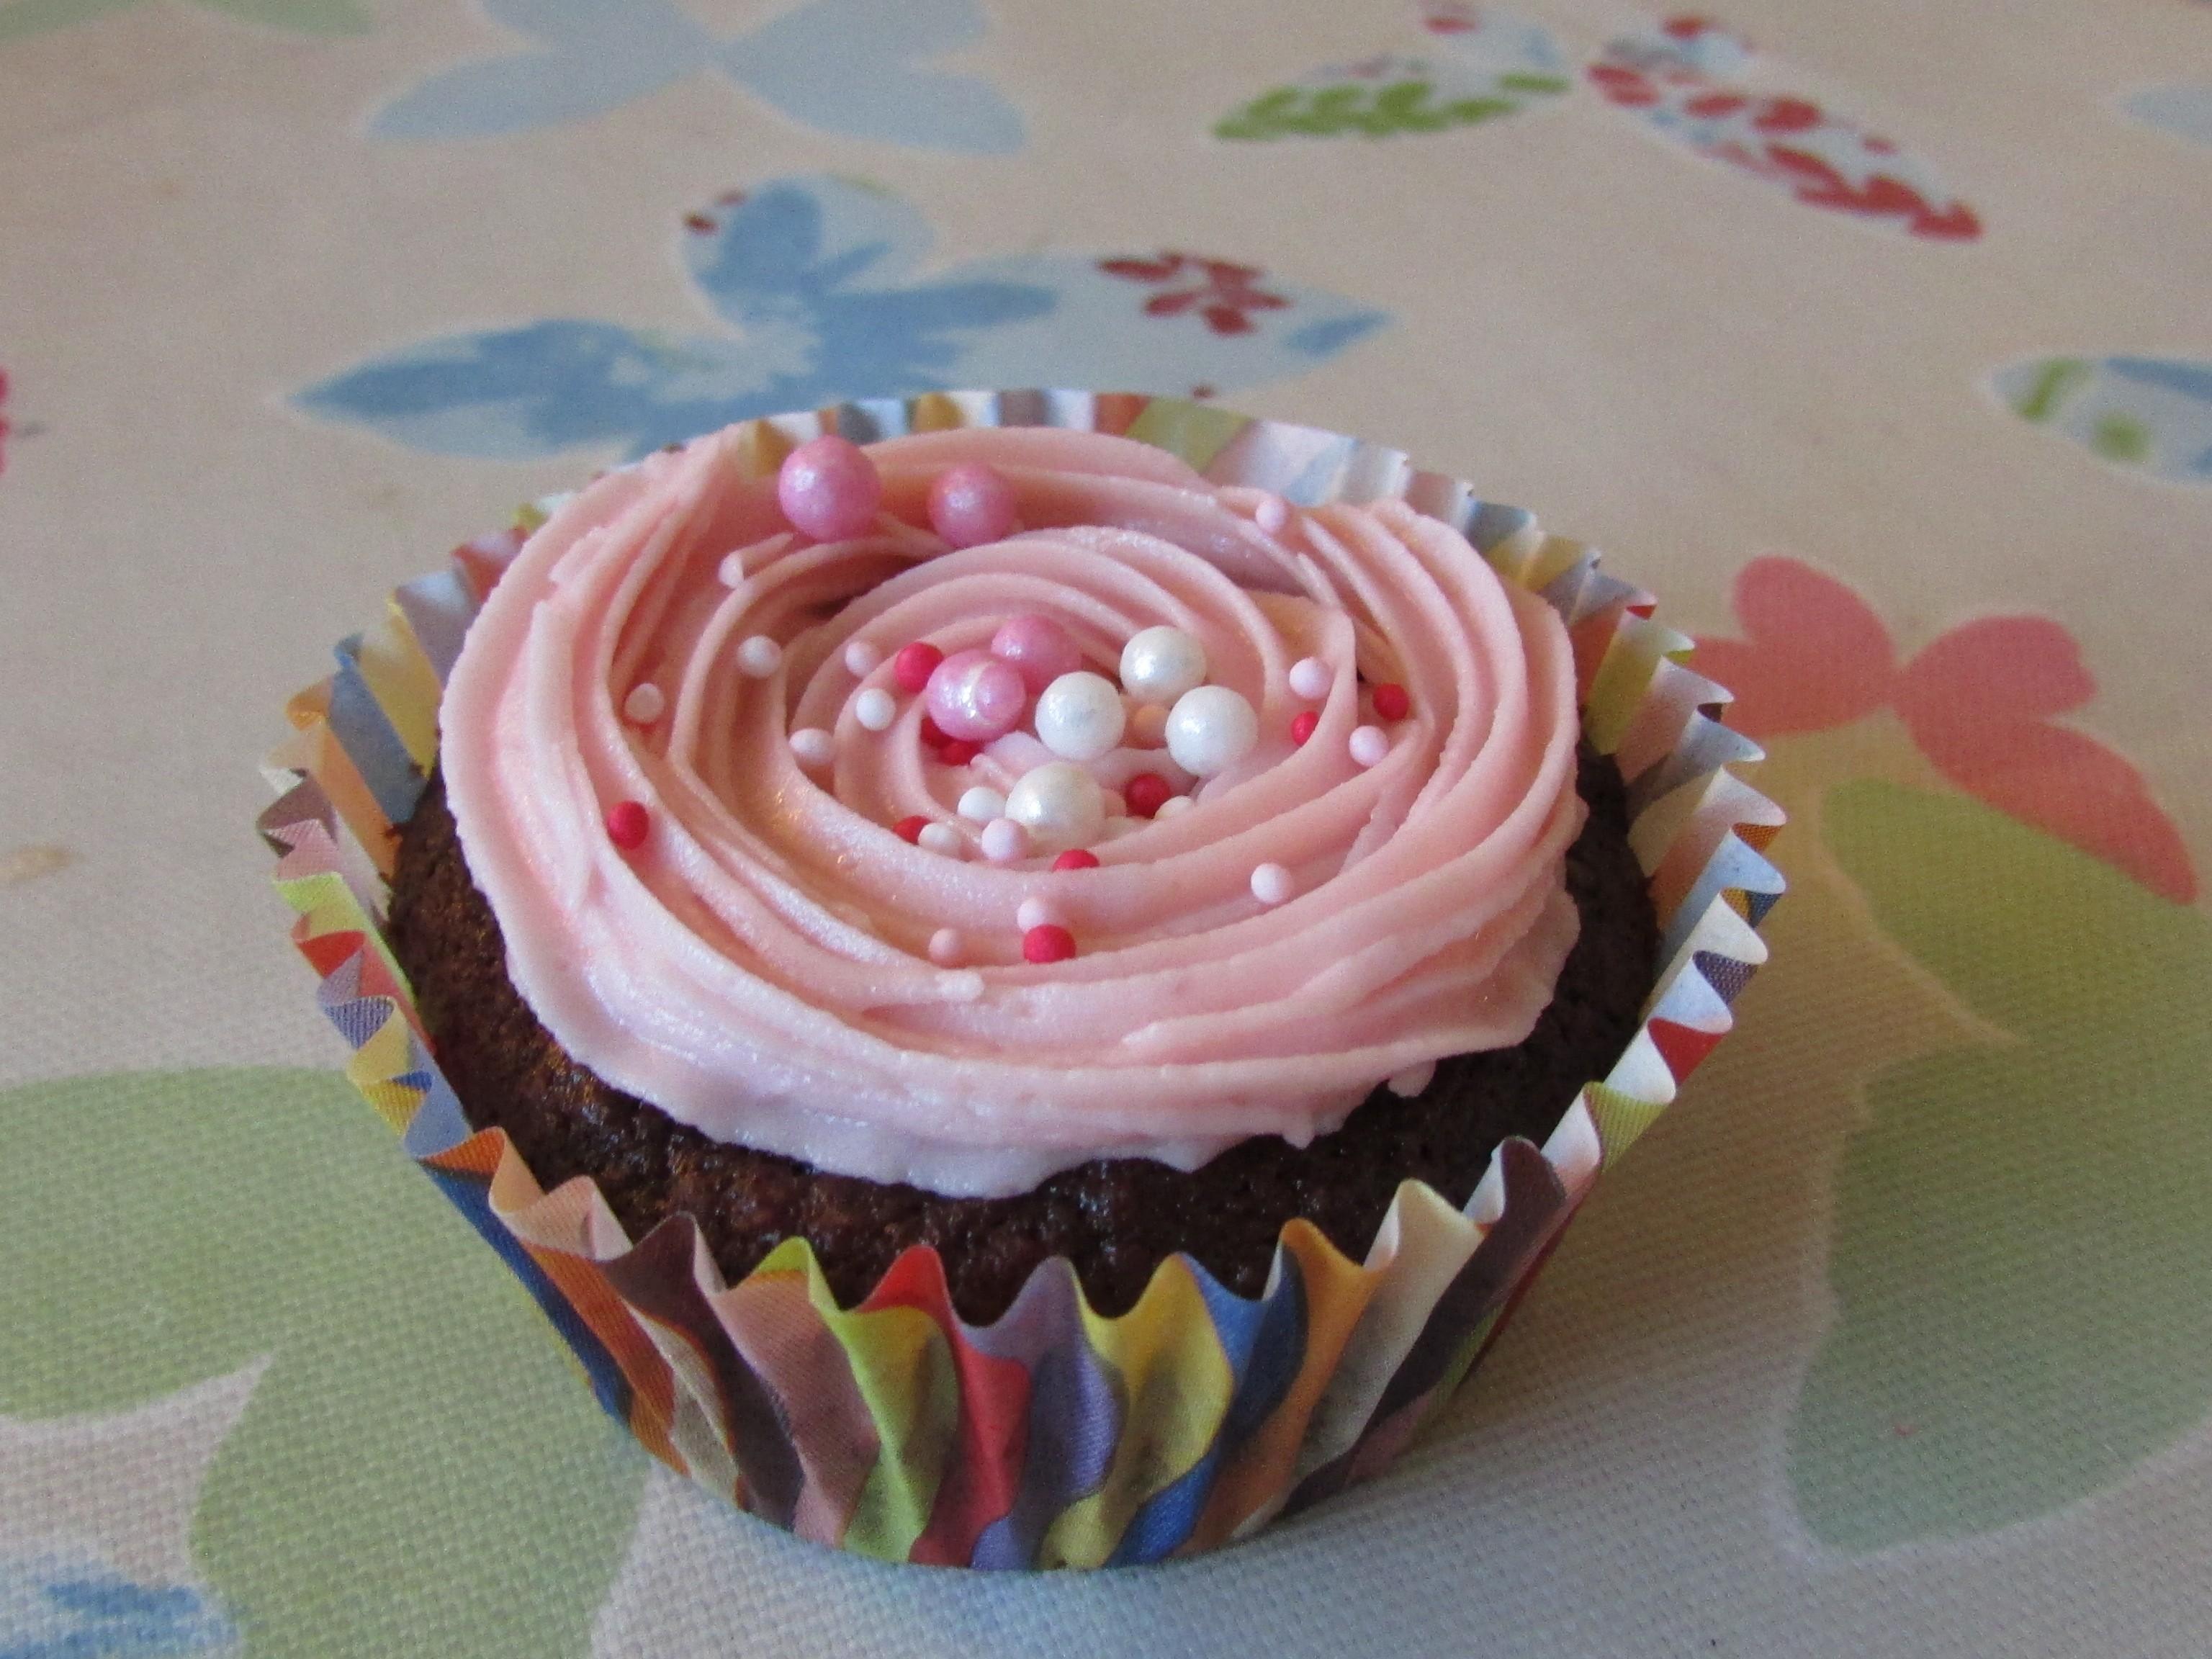 Fairy Cake Icing Recipe Uk: Beetroot Chocolate Cakes